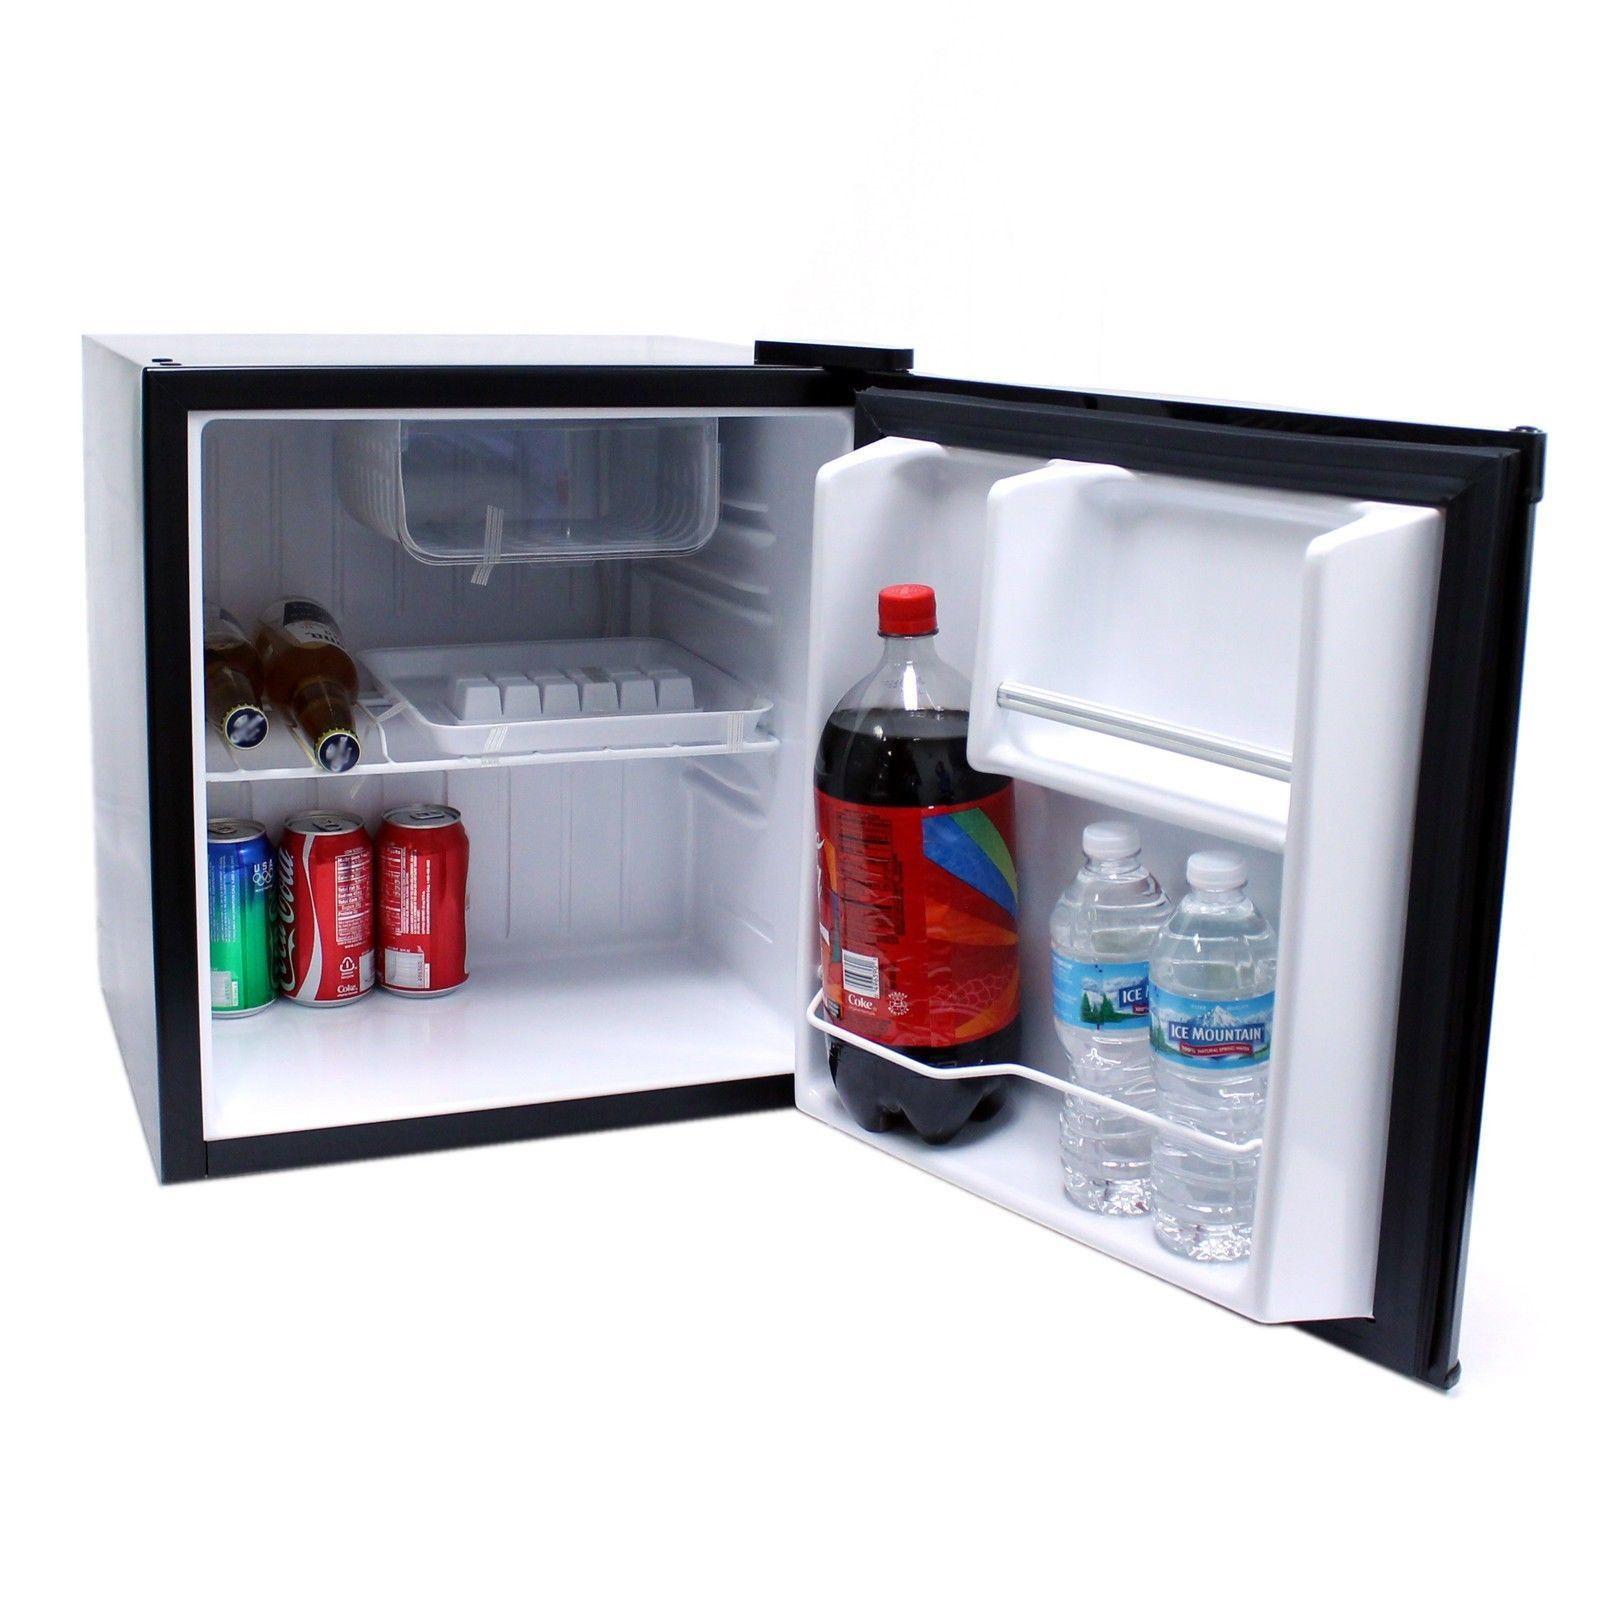 Office Fridge: Refrigerated: Office Refrigerator